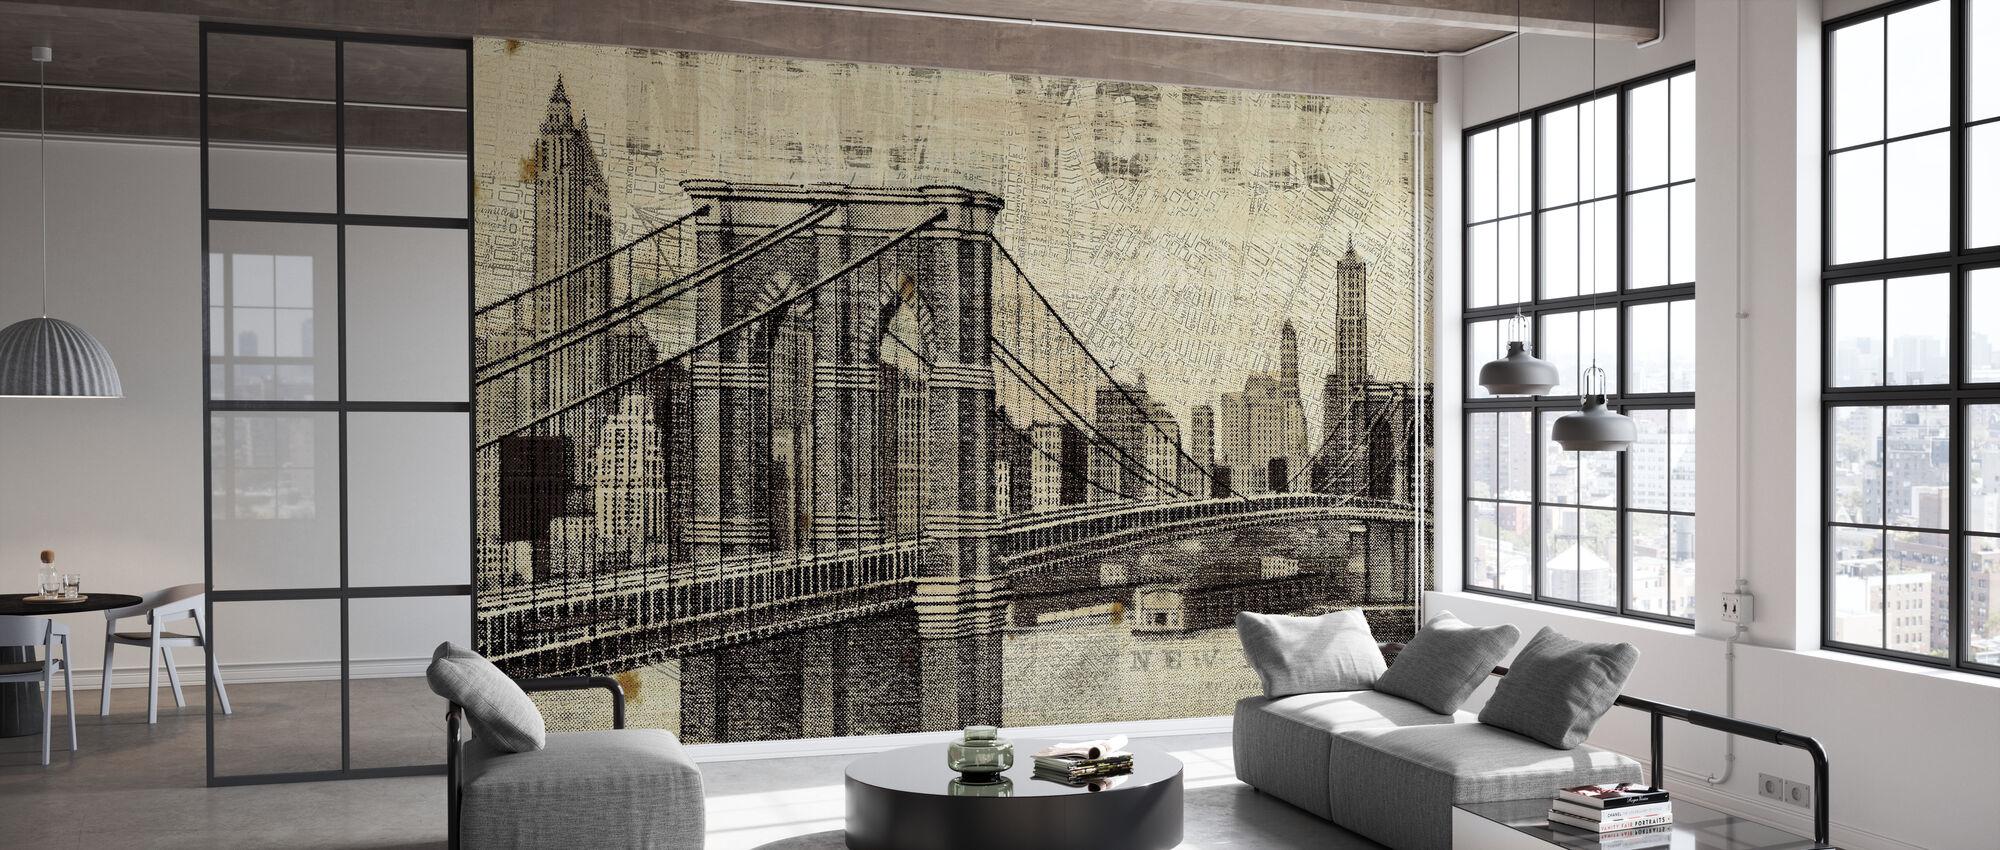 Vintage New York Brooklyn Bridge - Wallpaper - Office